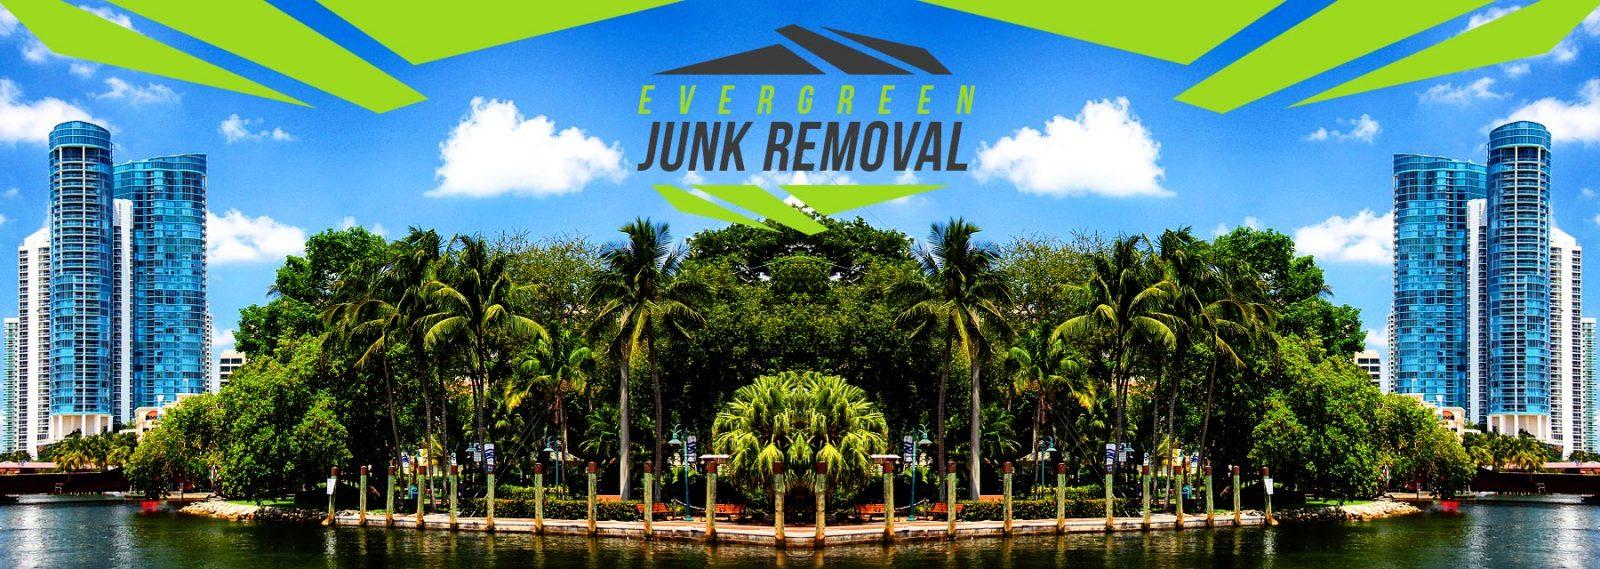 Franklin Park Hot Tub Removal Company